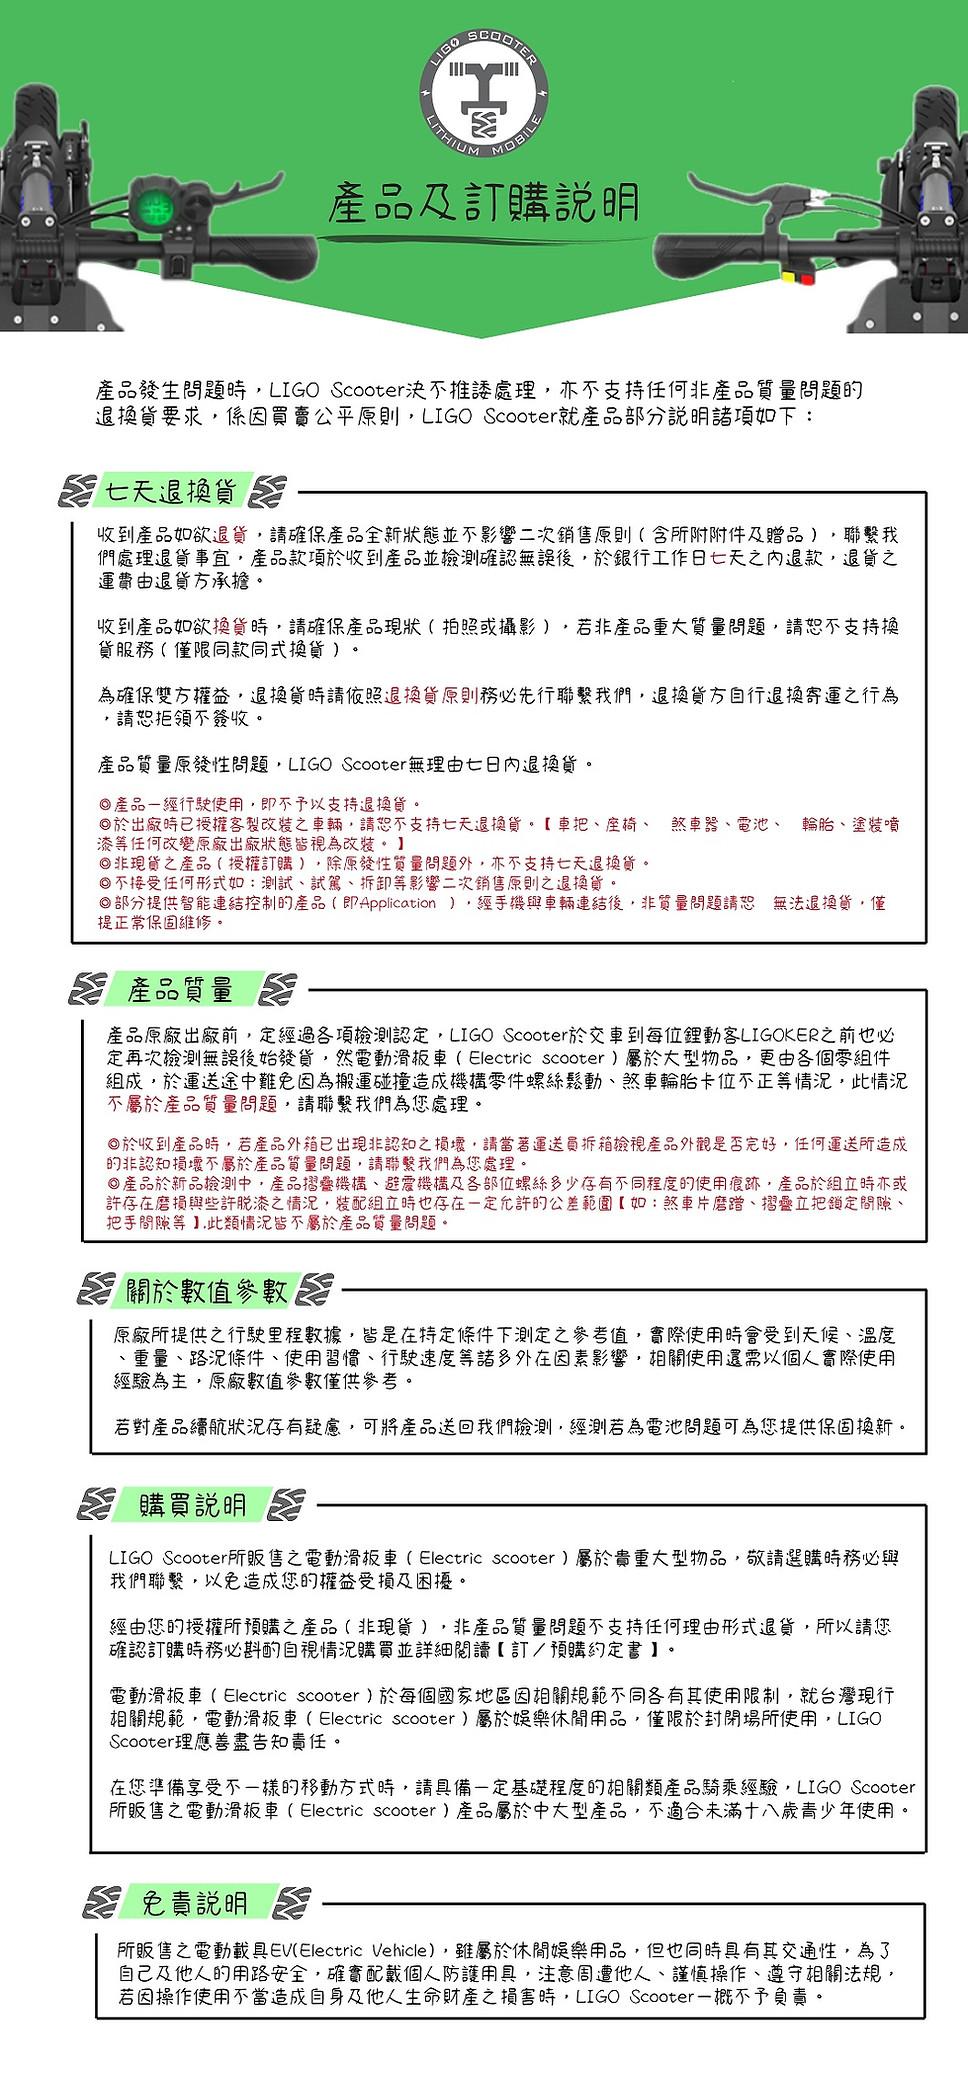 LIGO產品及訂購說明_七天退貨_購買說明_電動滑板車-210331.jpg